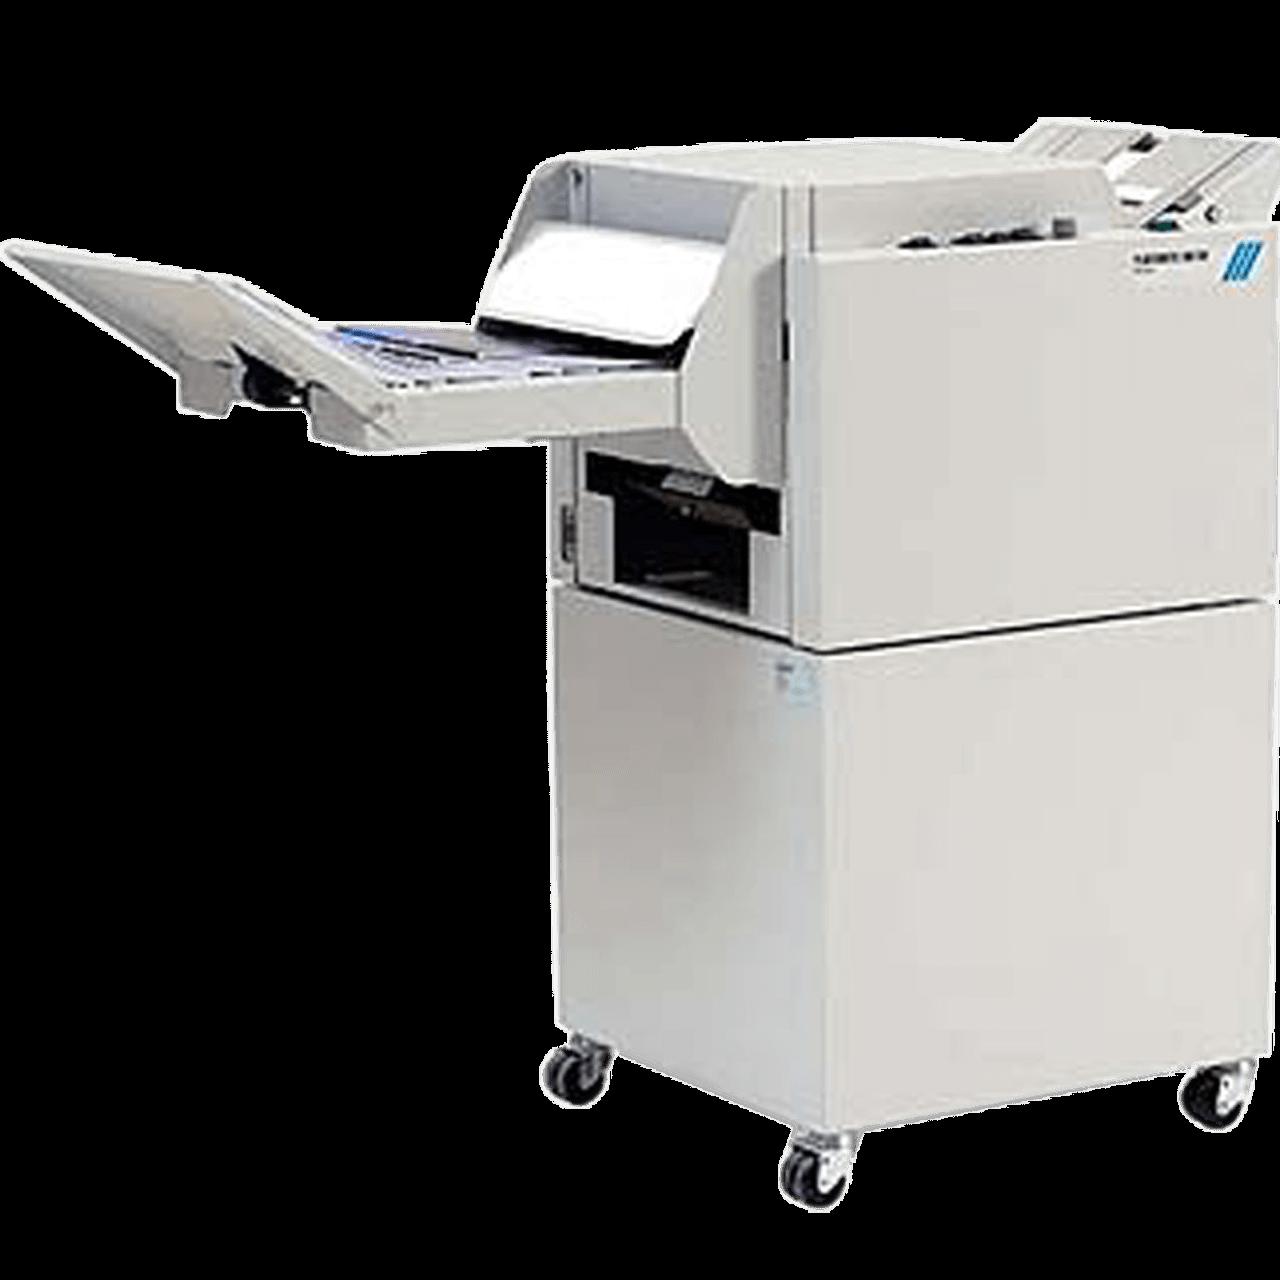 HEFTER SYSTEMFORM  BM 60 Doppel Broschürenhefter | automatisch